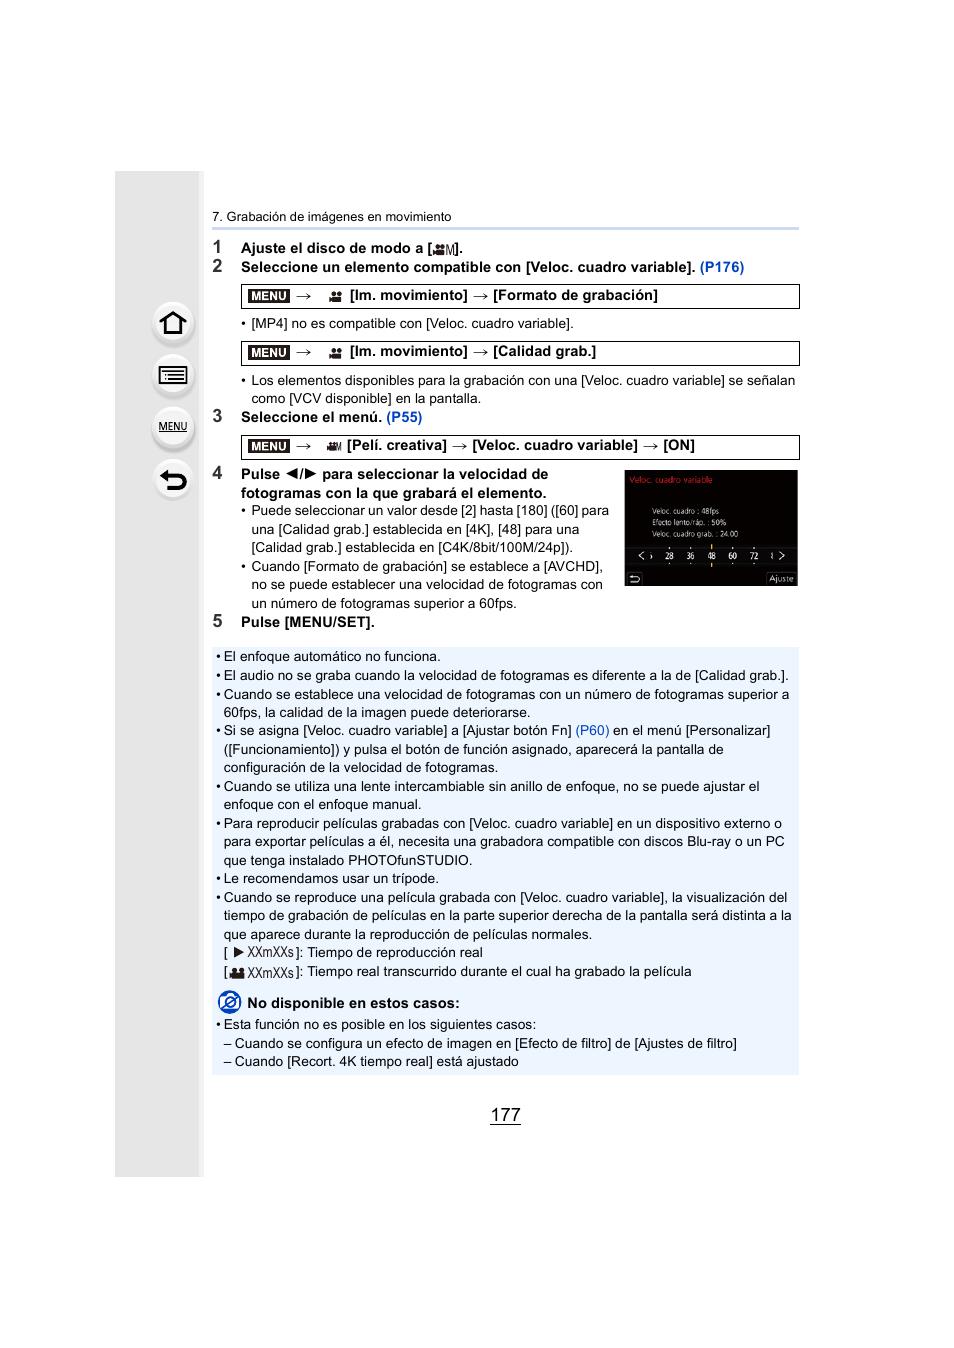 Panasonic Lumix GH5 Manual del usuario | Página 177 / 347